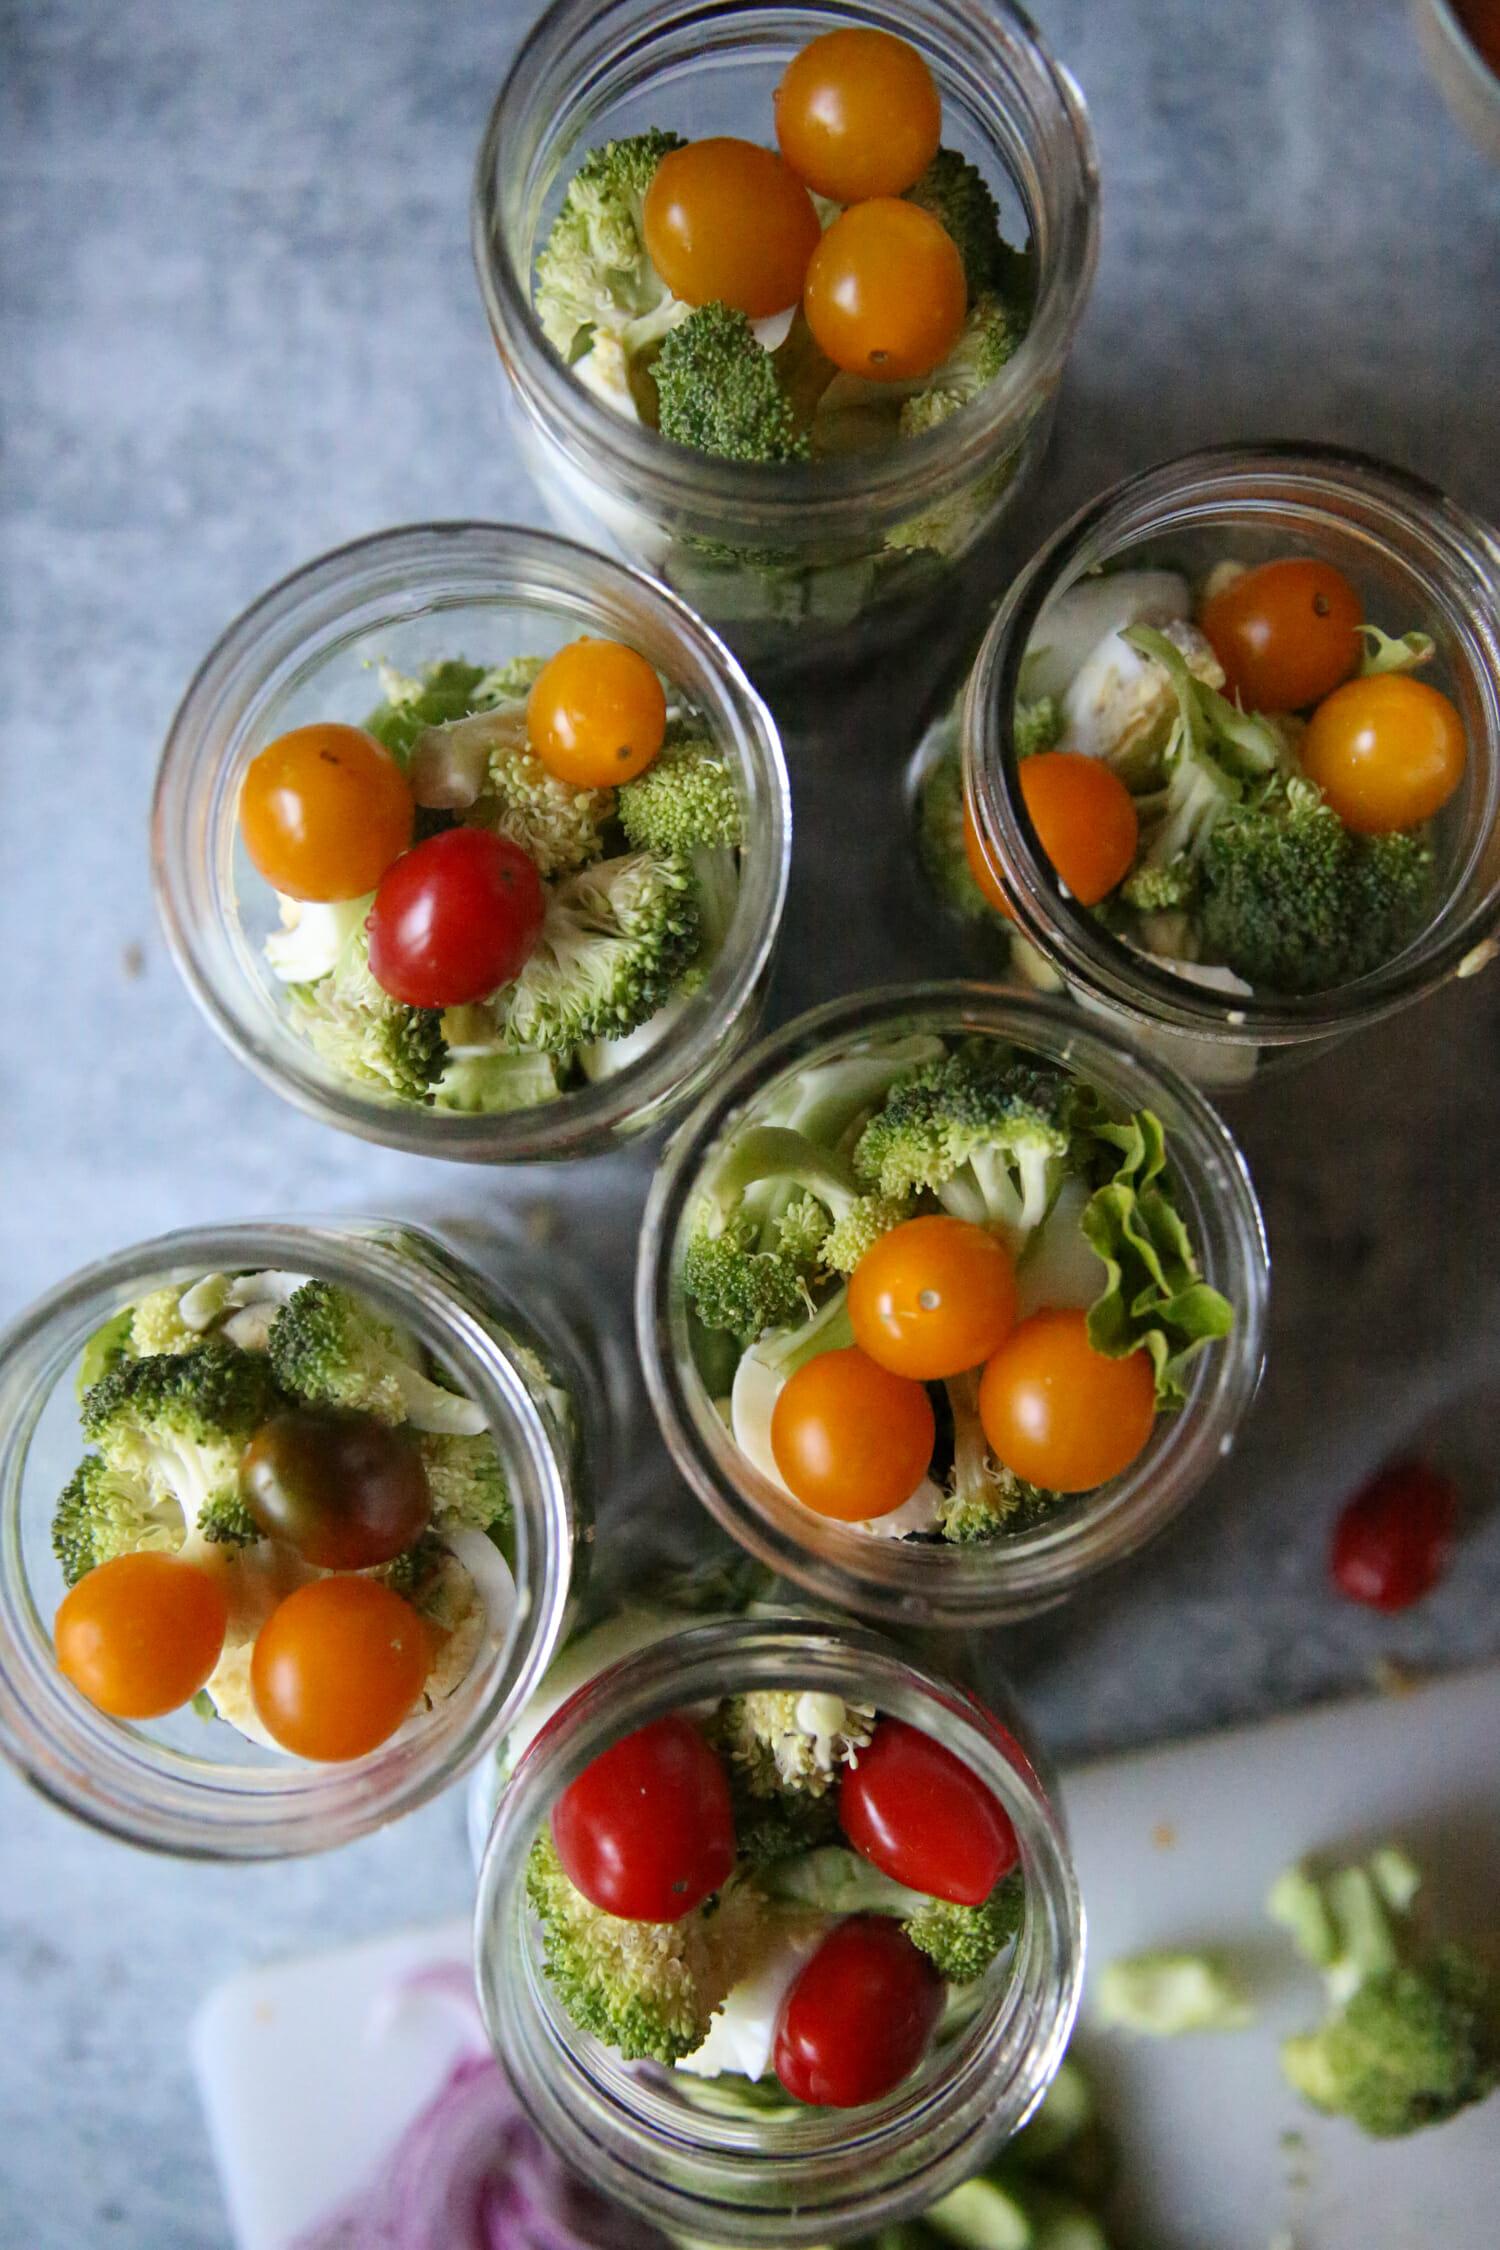 broccoli and tomatoes in salad jars